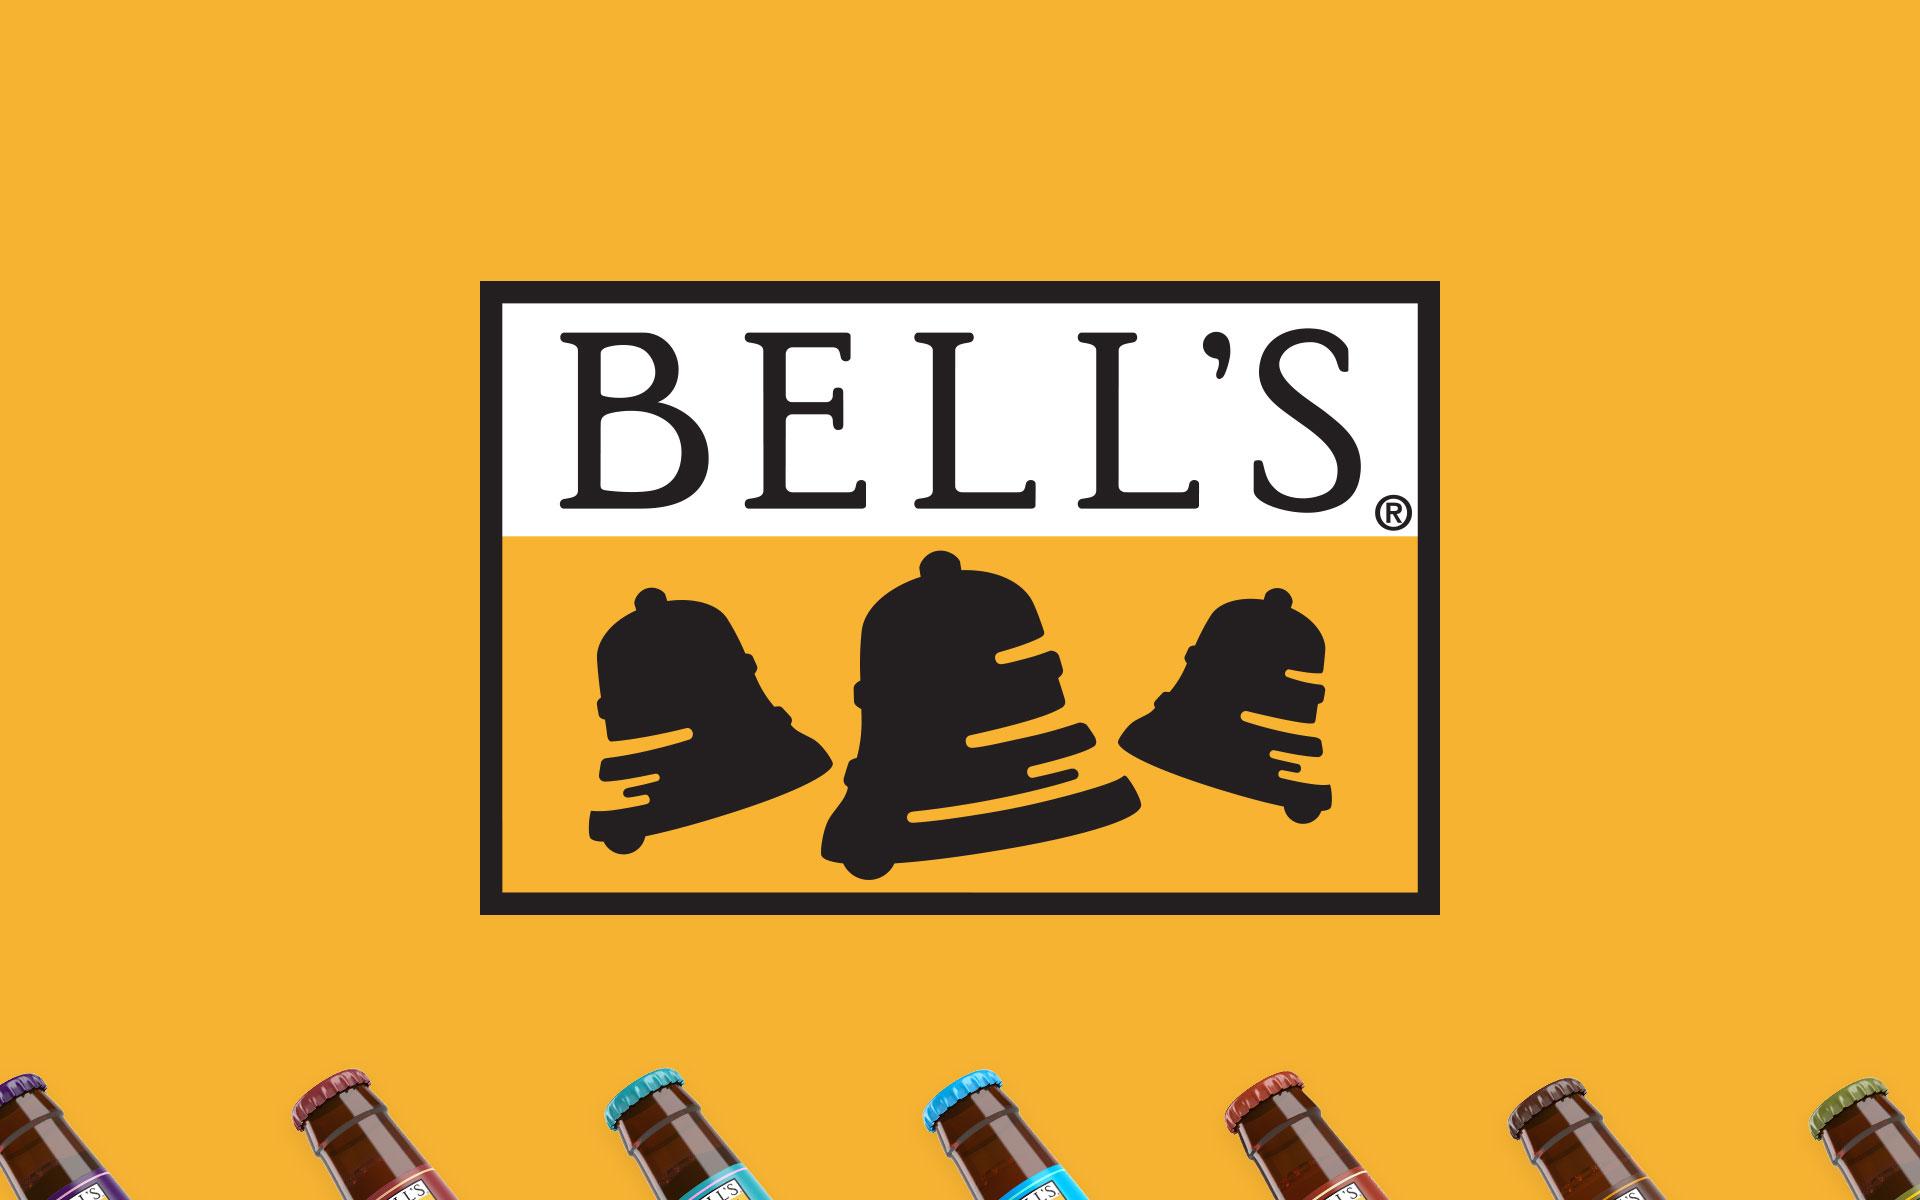 Bell's Brewery - Brand Identity